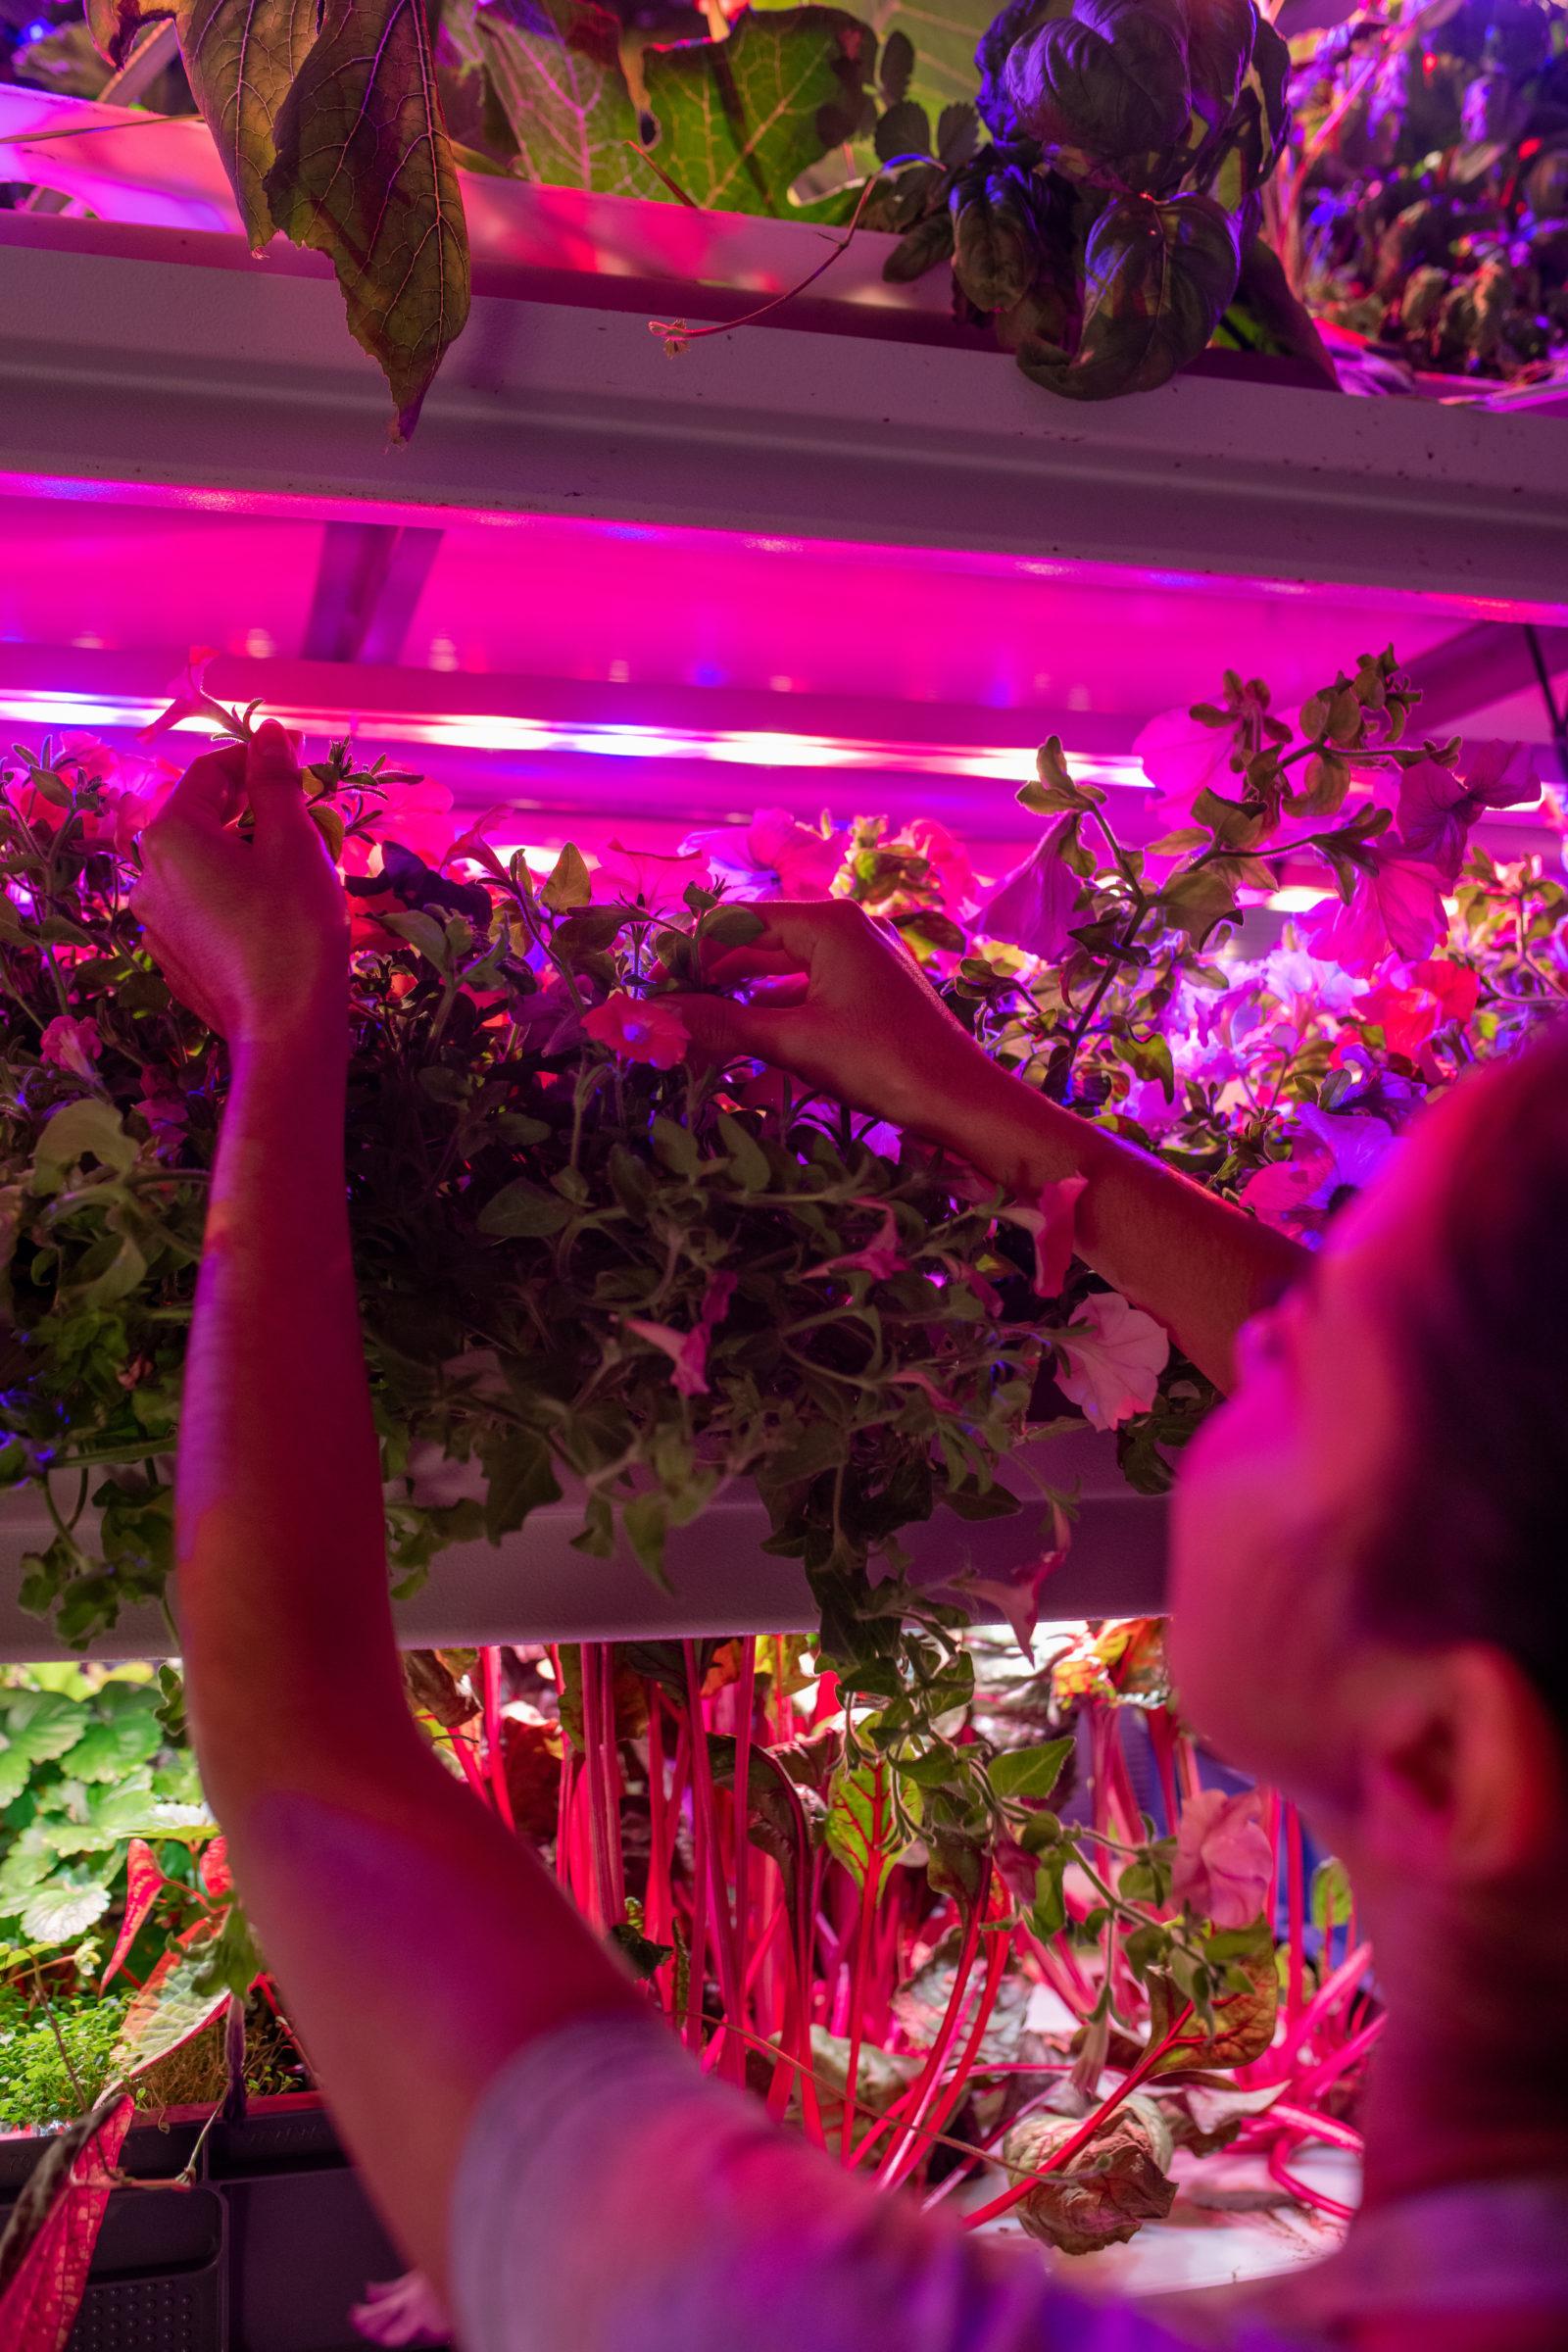 raising plants under led lamps BGB4X7J